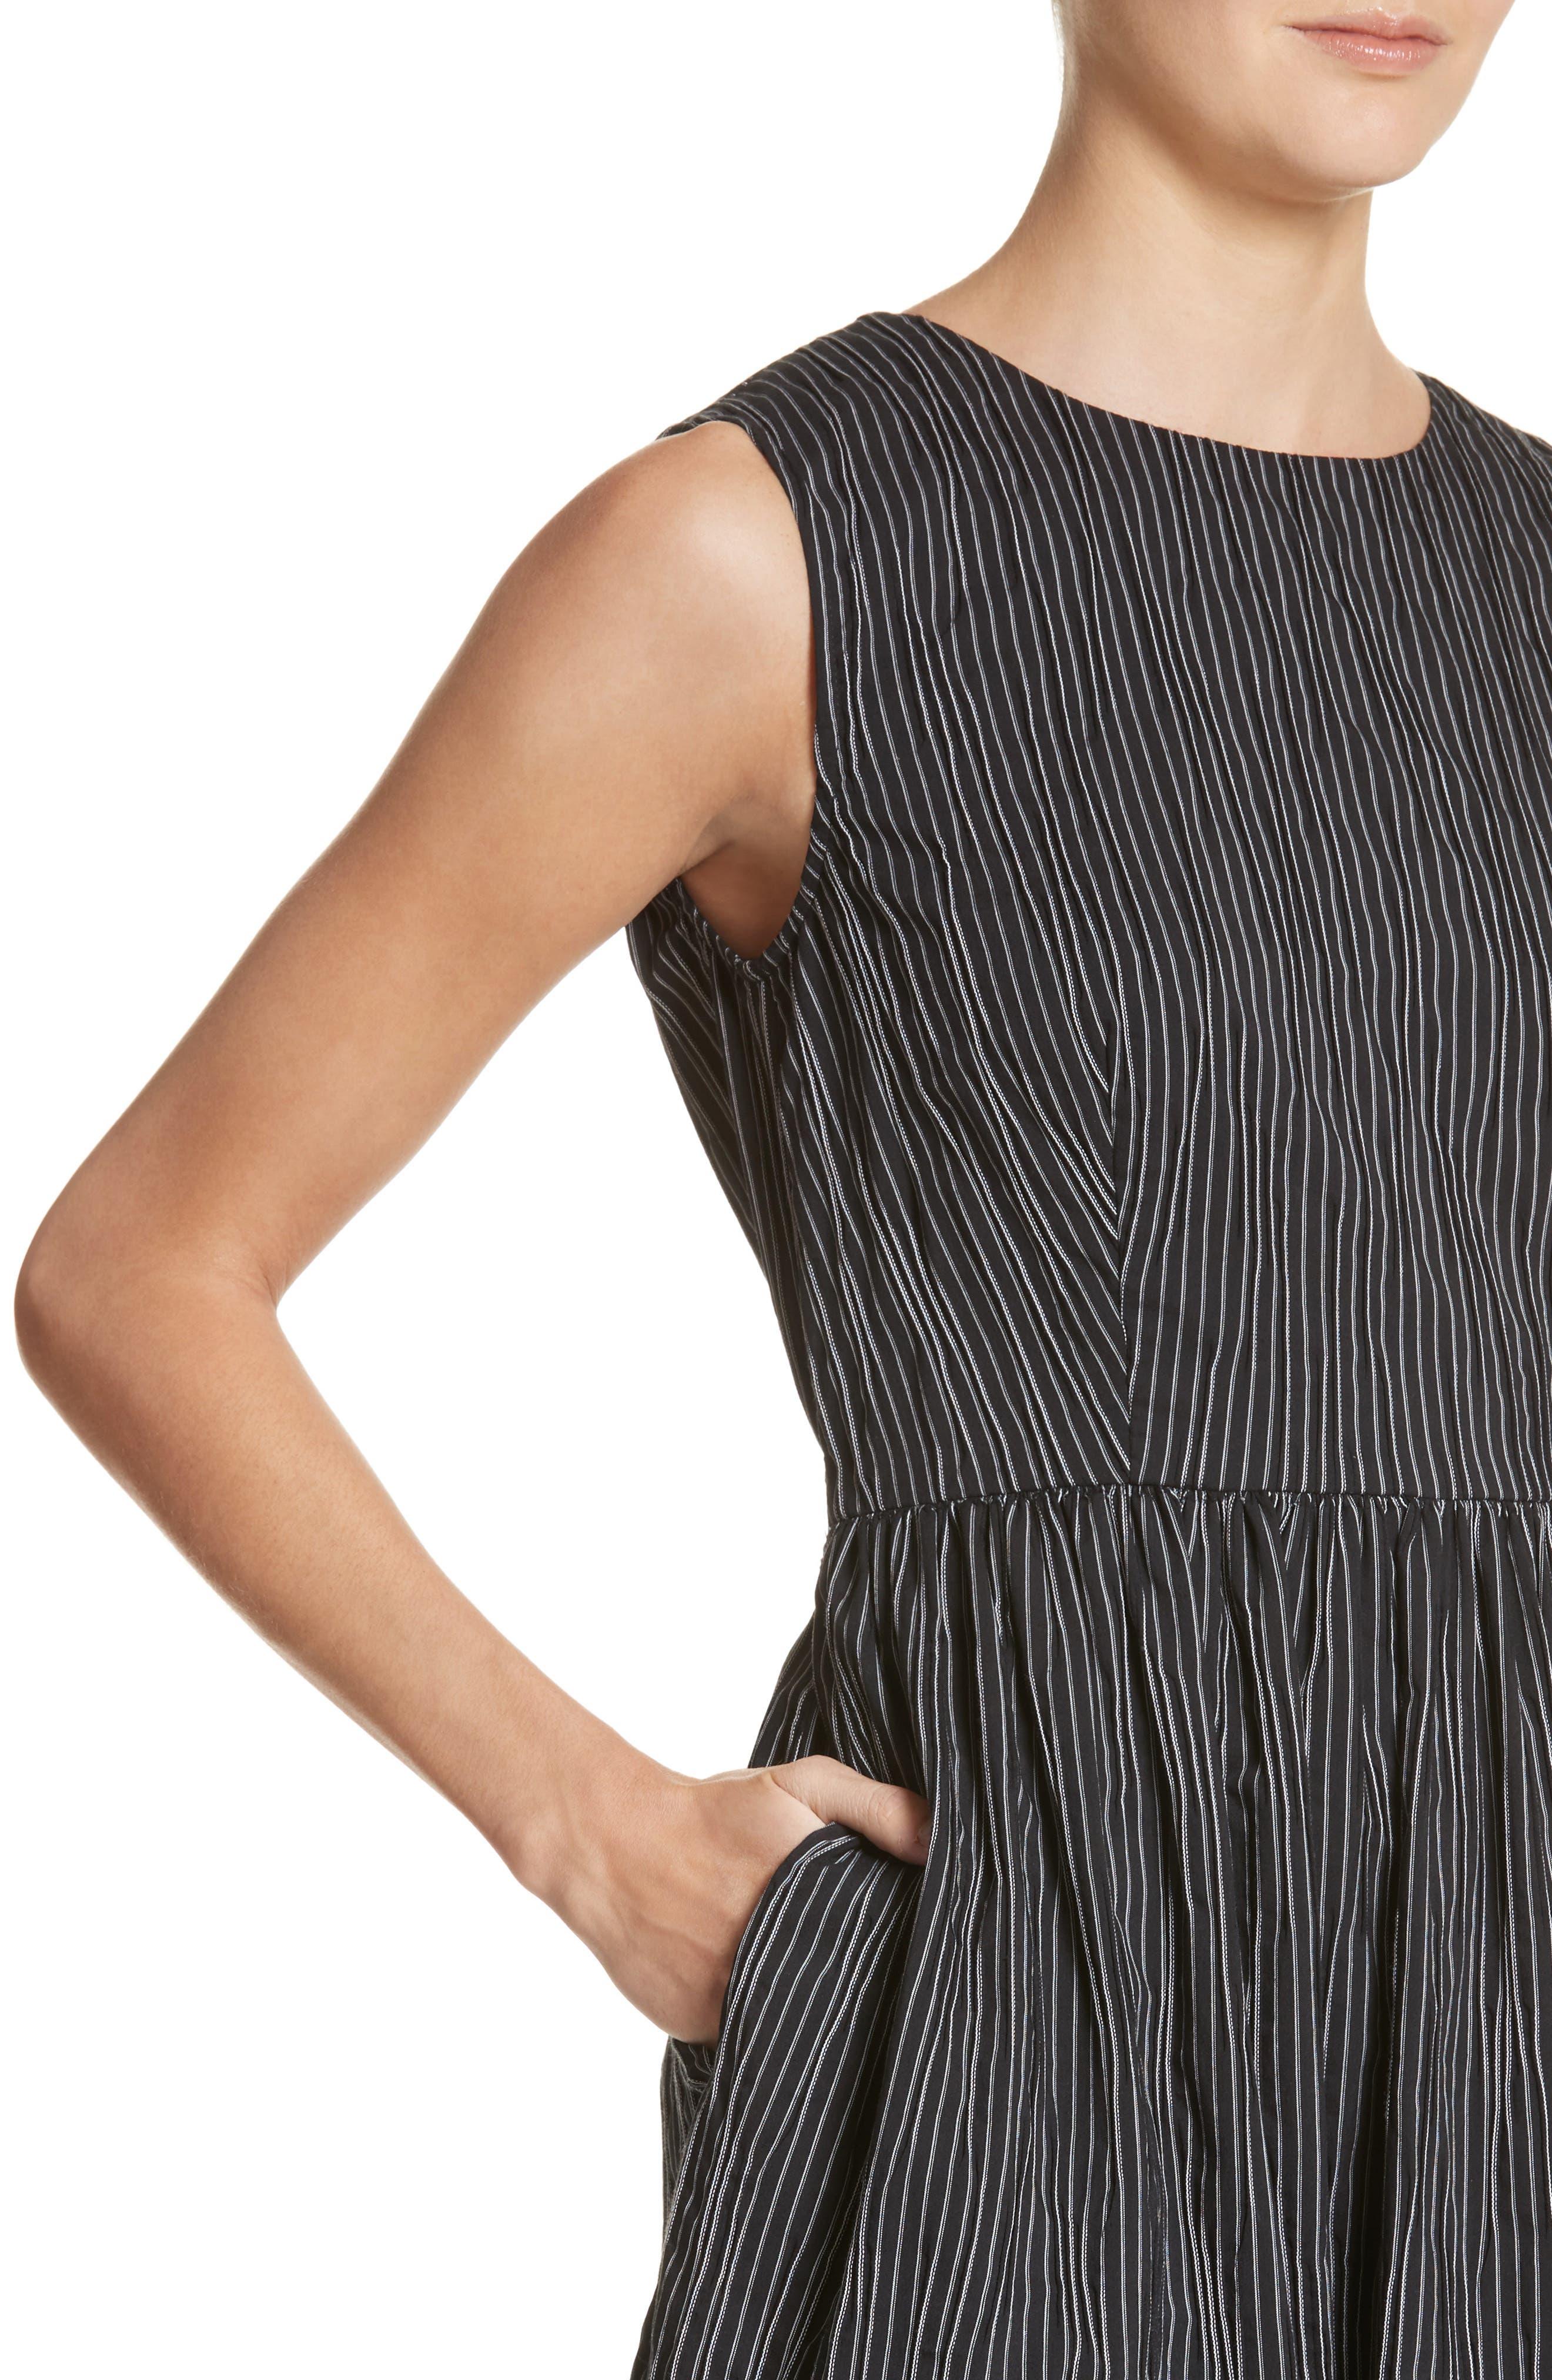 Stripe Crinkle Cotton Blend Midi Dress,                             Alternate thumbnail 4, color,                             010